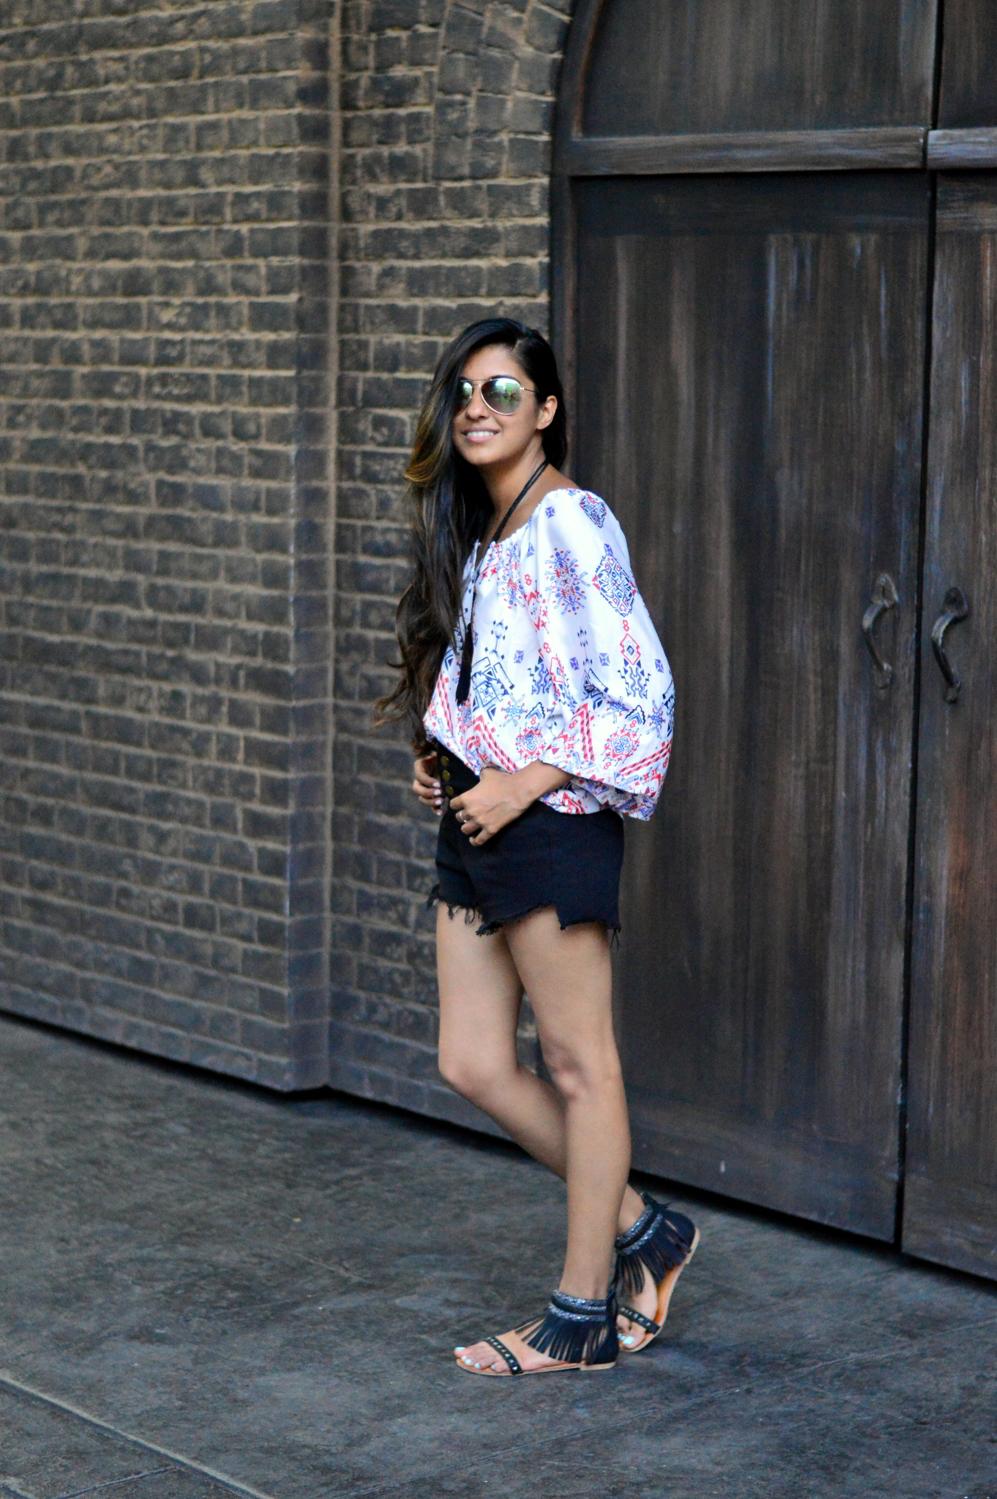 denim-highwaisted-cutoff-shorts-printed-peasant-blouse-summer-travel-florida-style 7